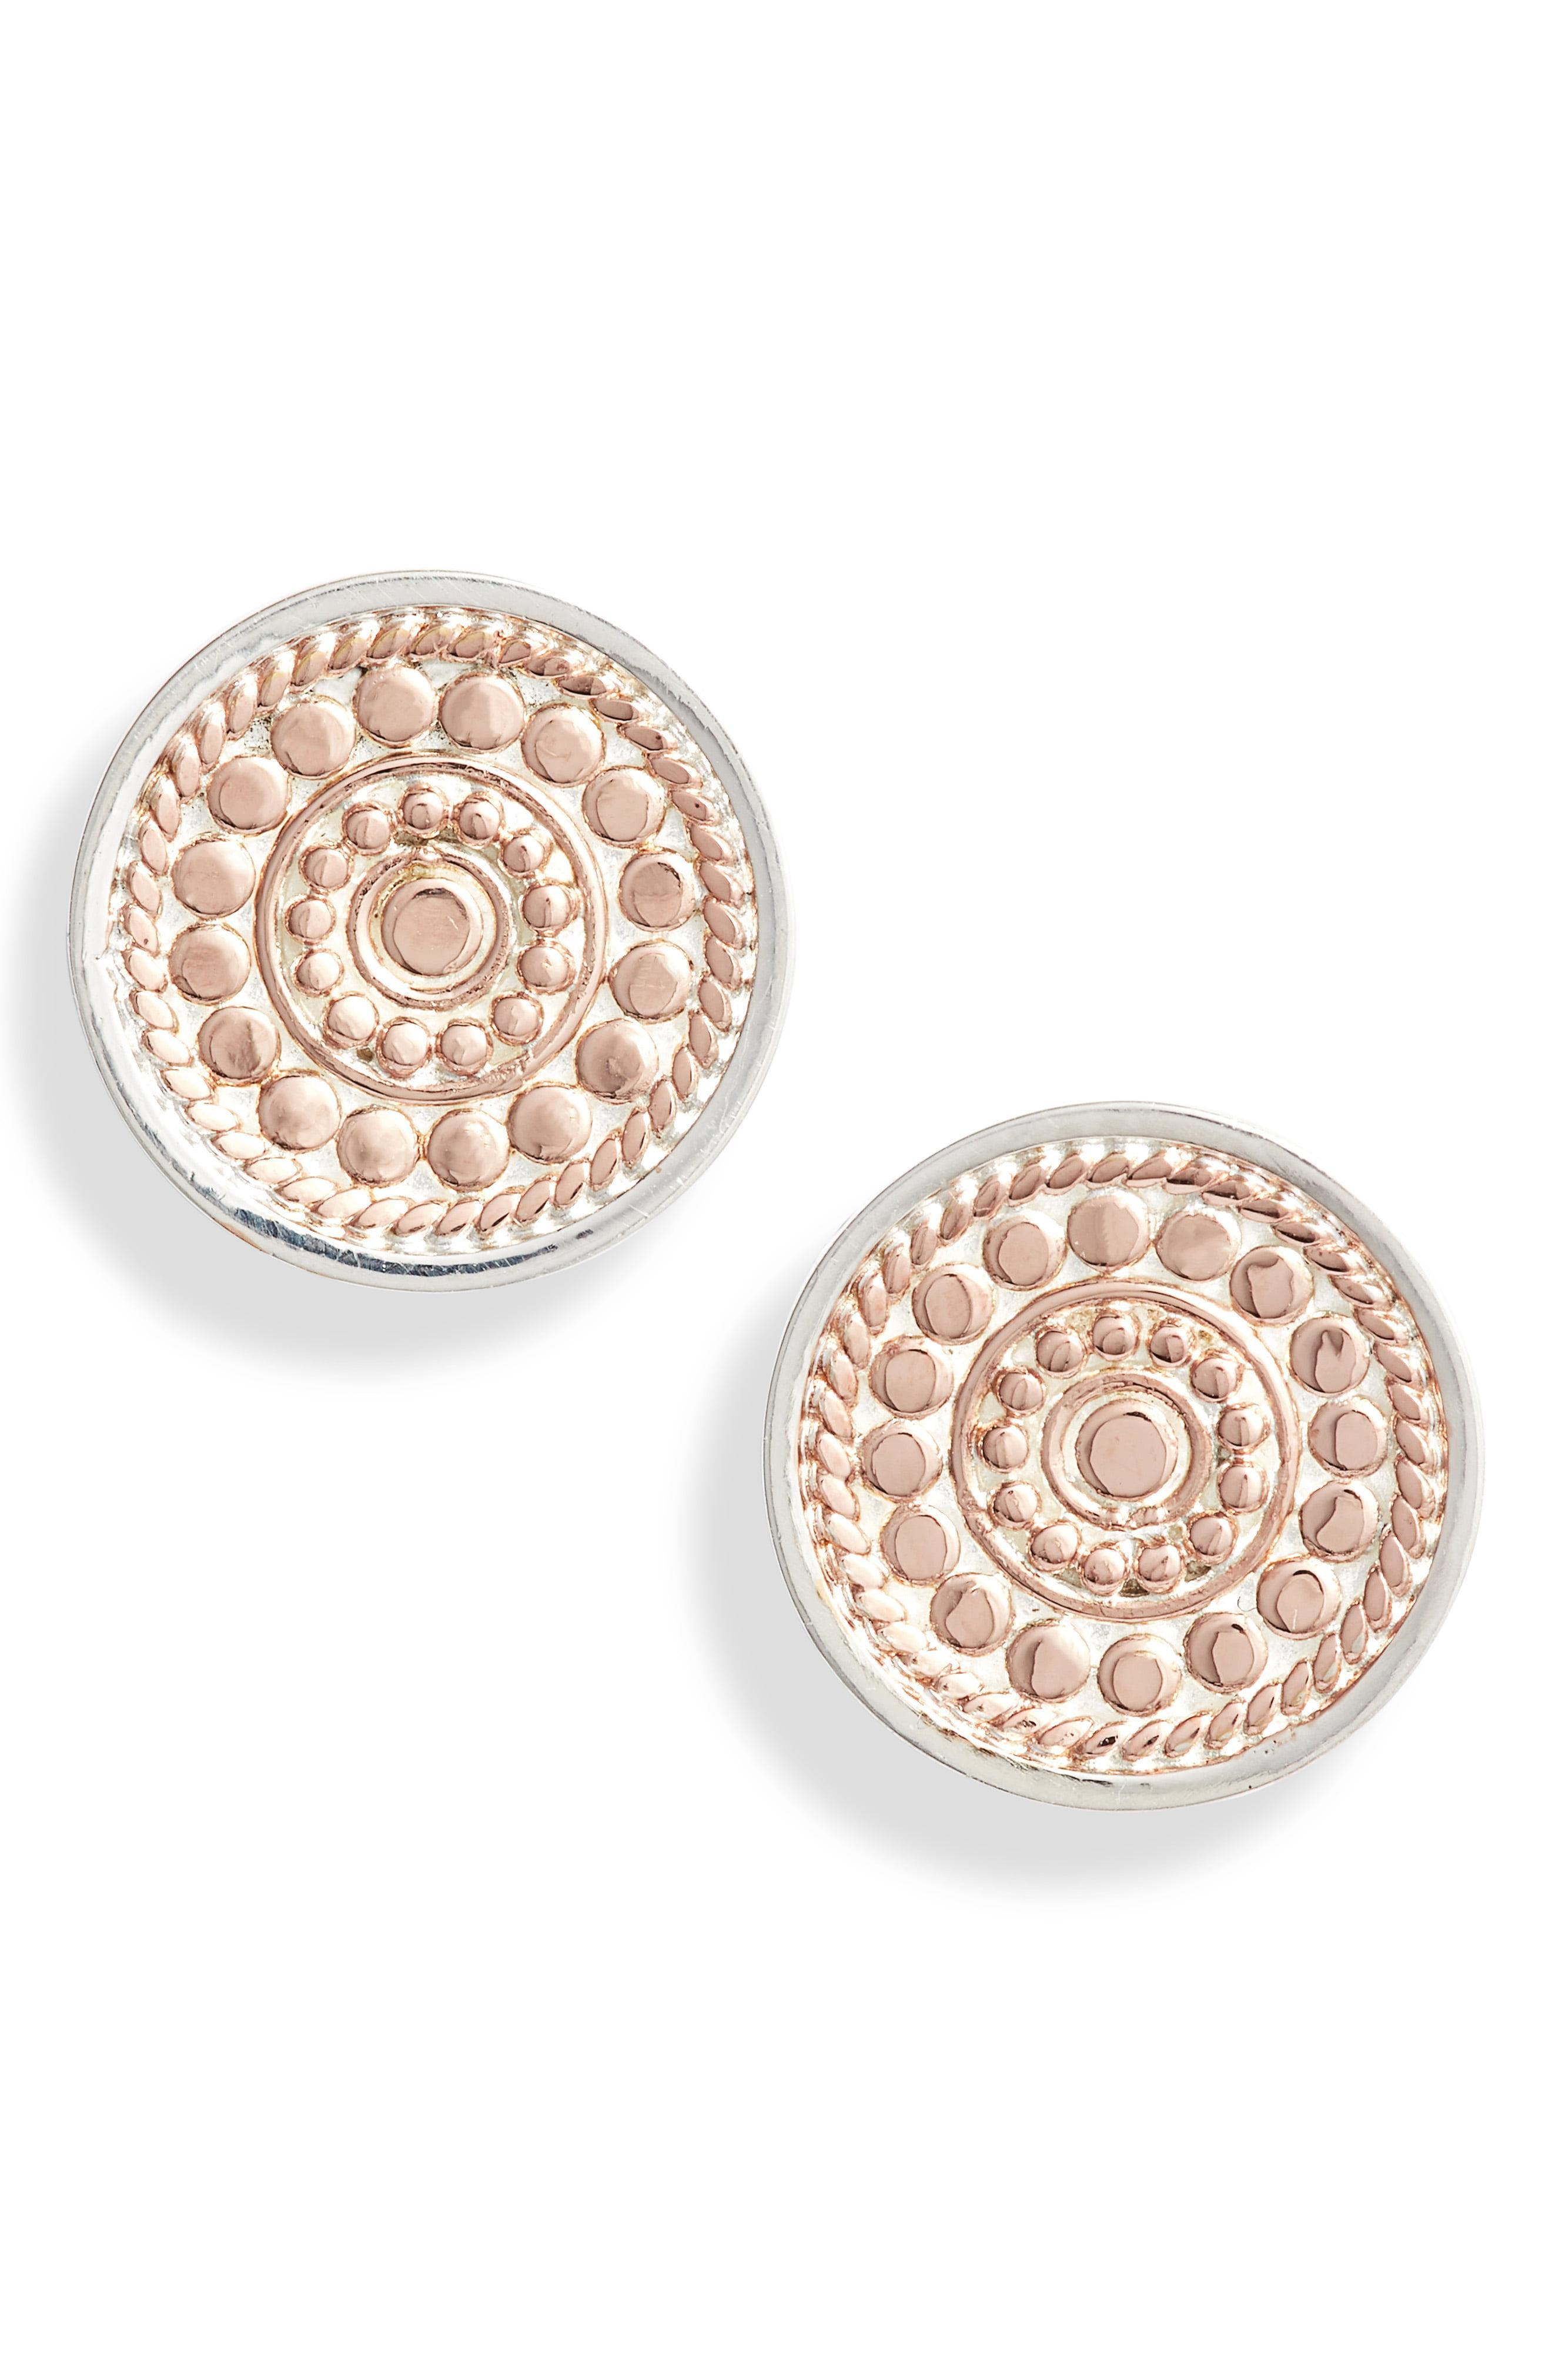 960b8b356 Lyst - Anna Beck Granulation Circle Stud Earrings in Metallic